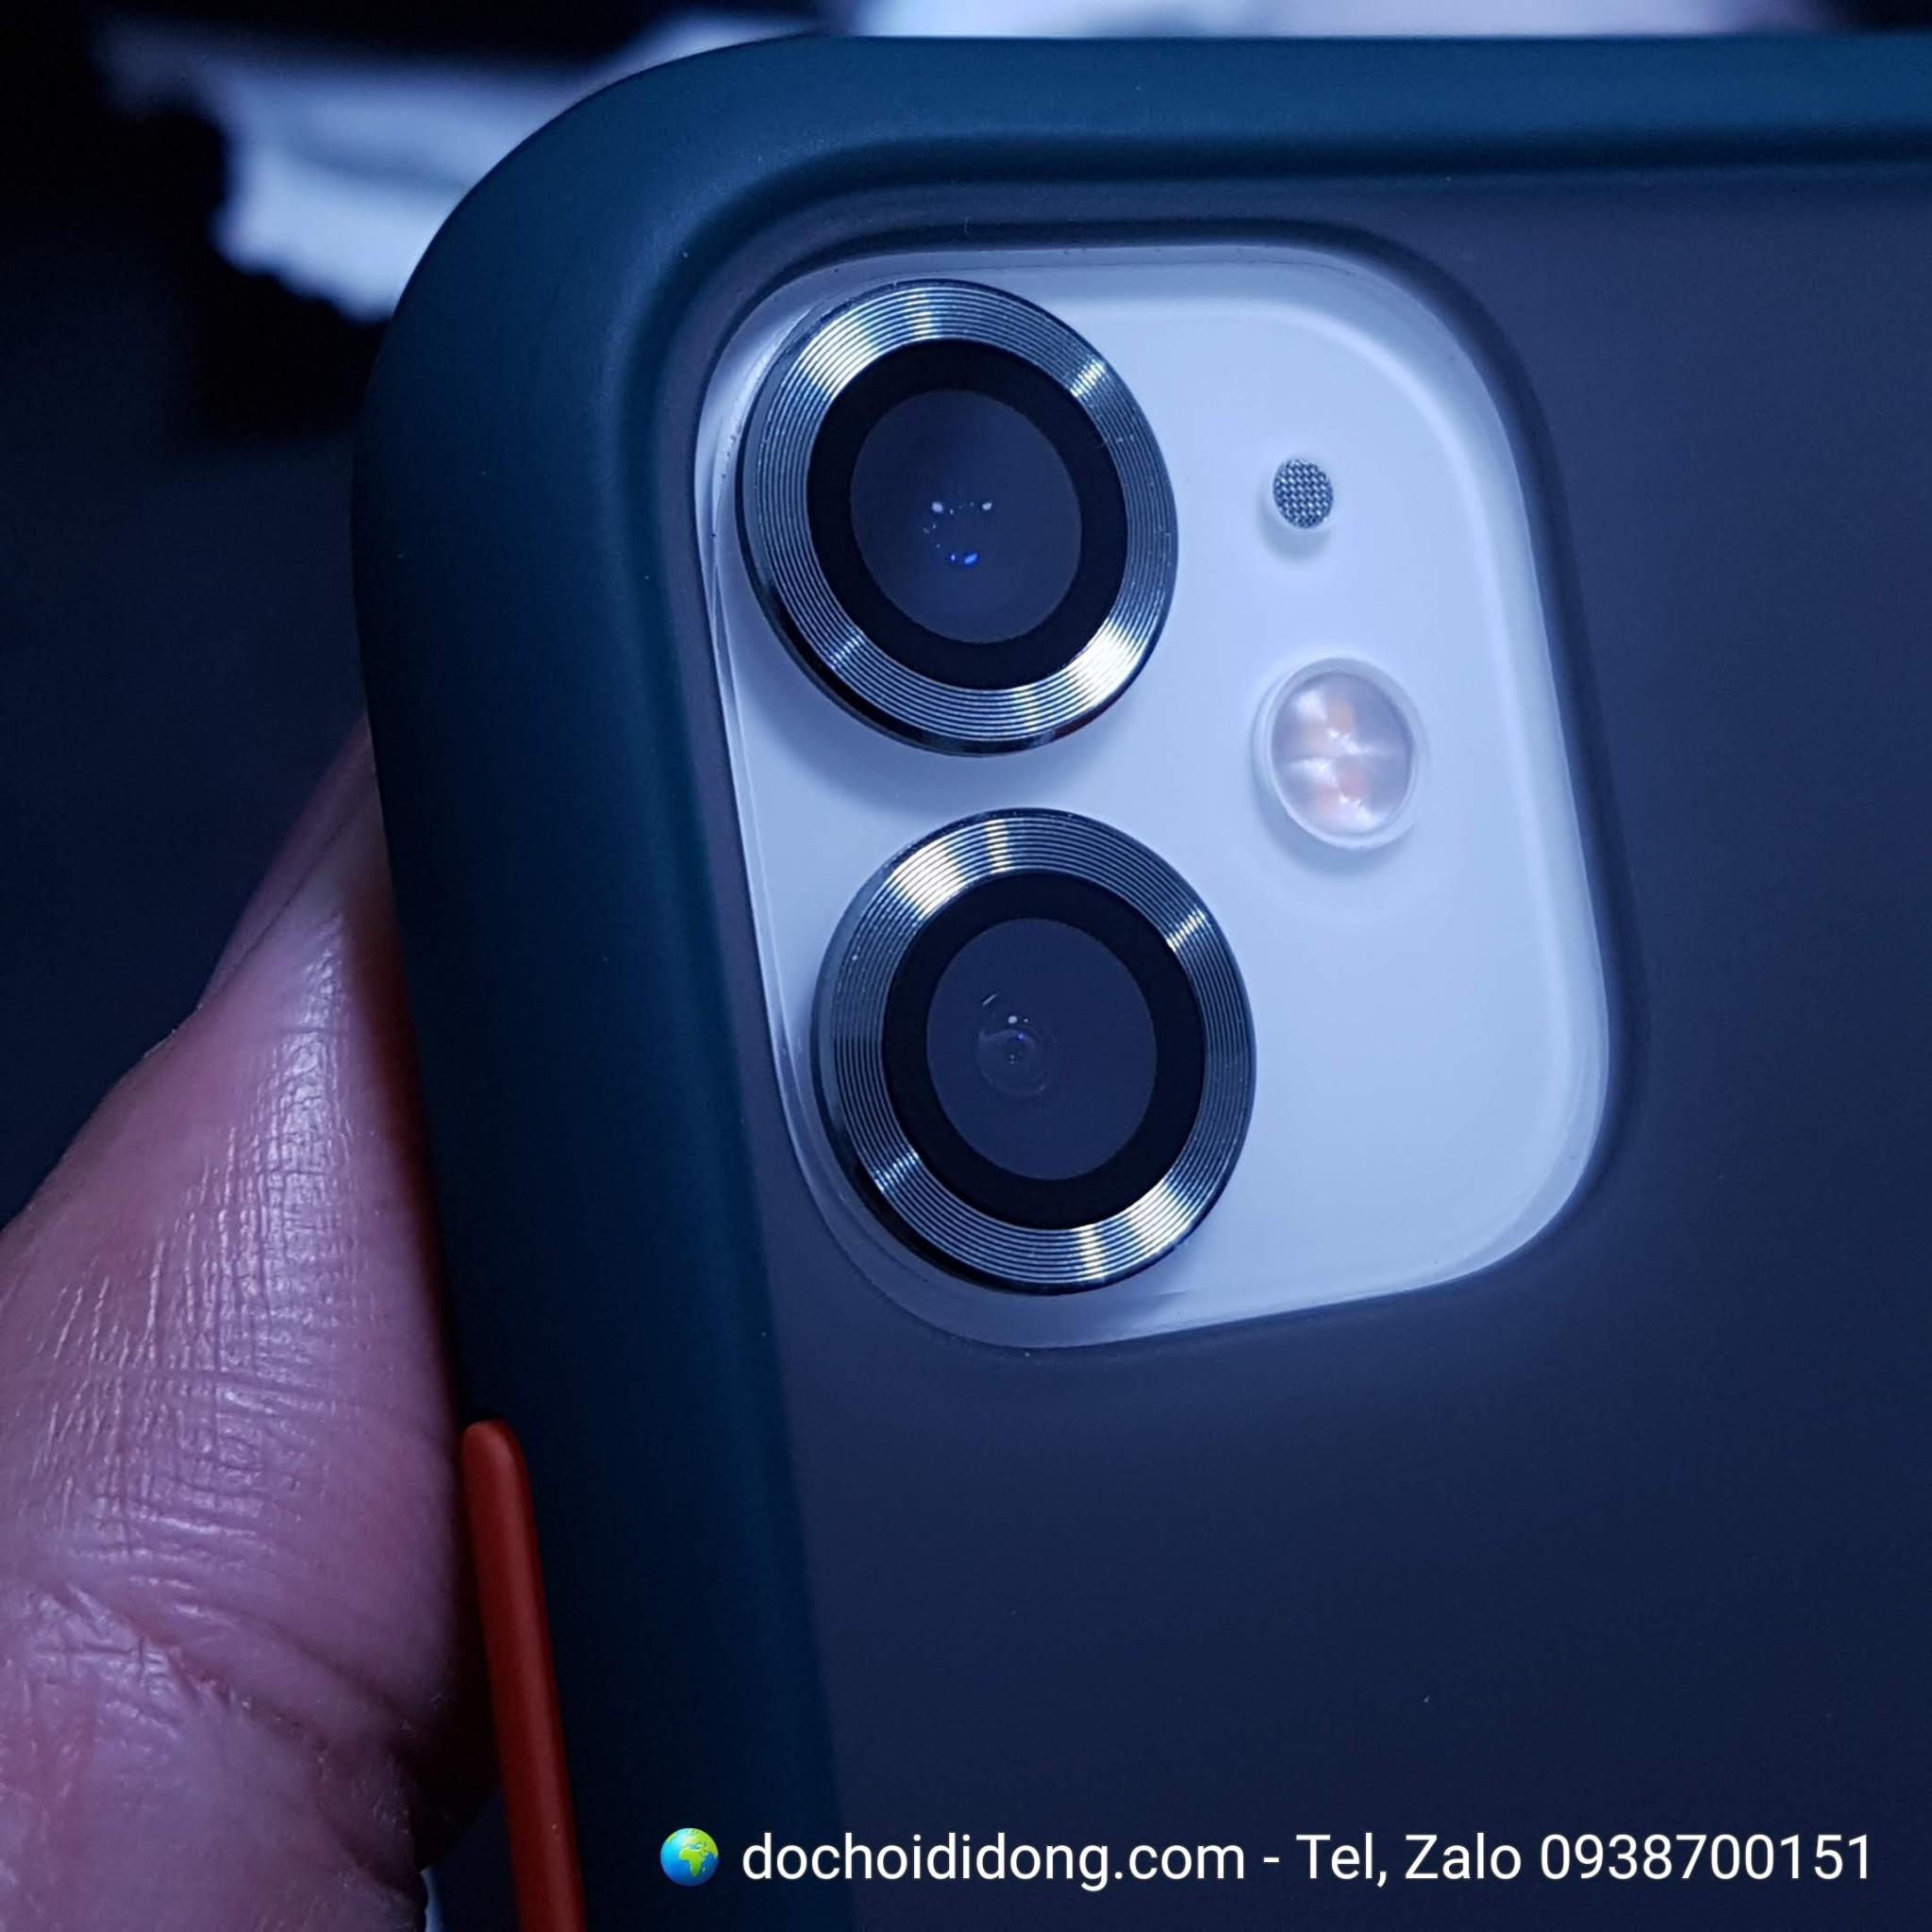 vong-bao-ve-camera-iphone-11-pro-va-pro-max-cac-thuong-hieu